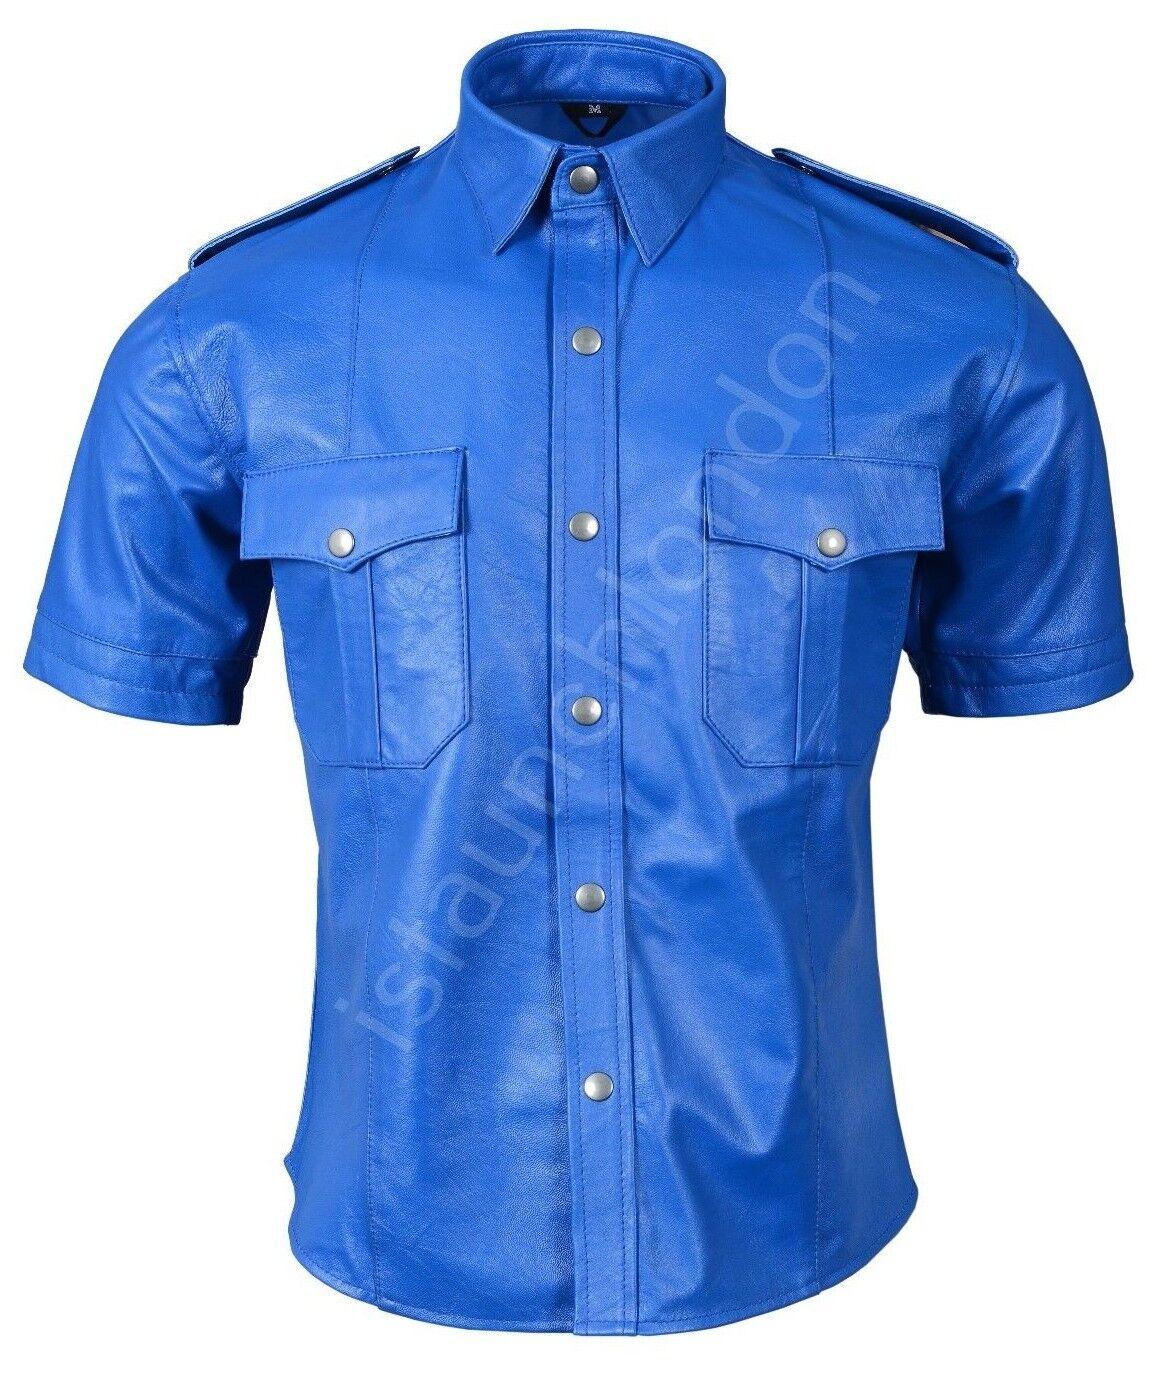 Mens Hot Genuine Real bluee Sheep Lamb LEATHER Police Uniform Shirt blueF Gay